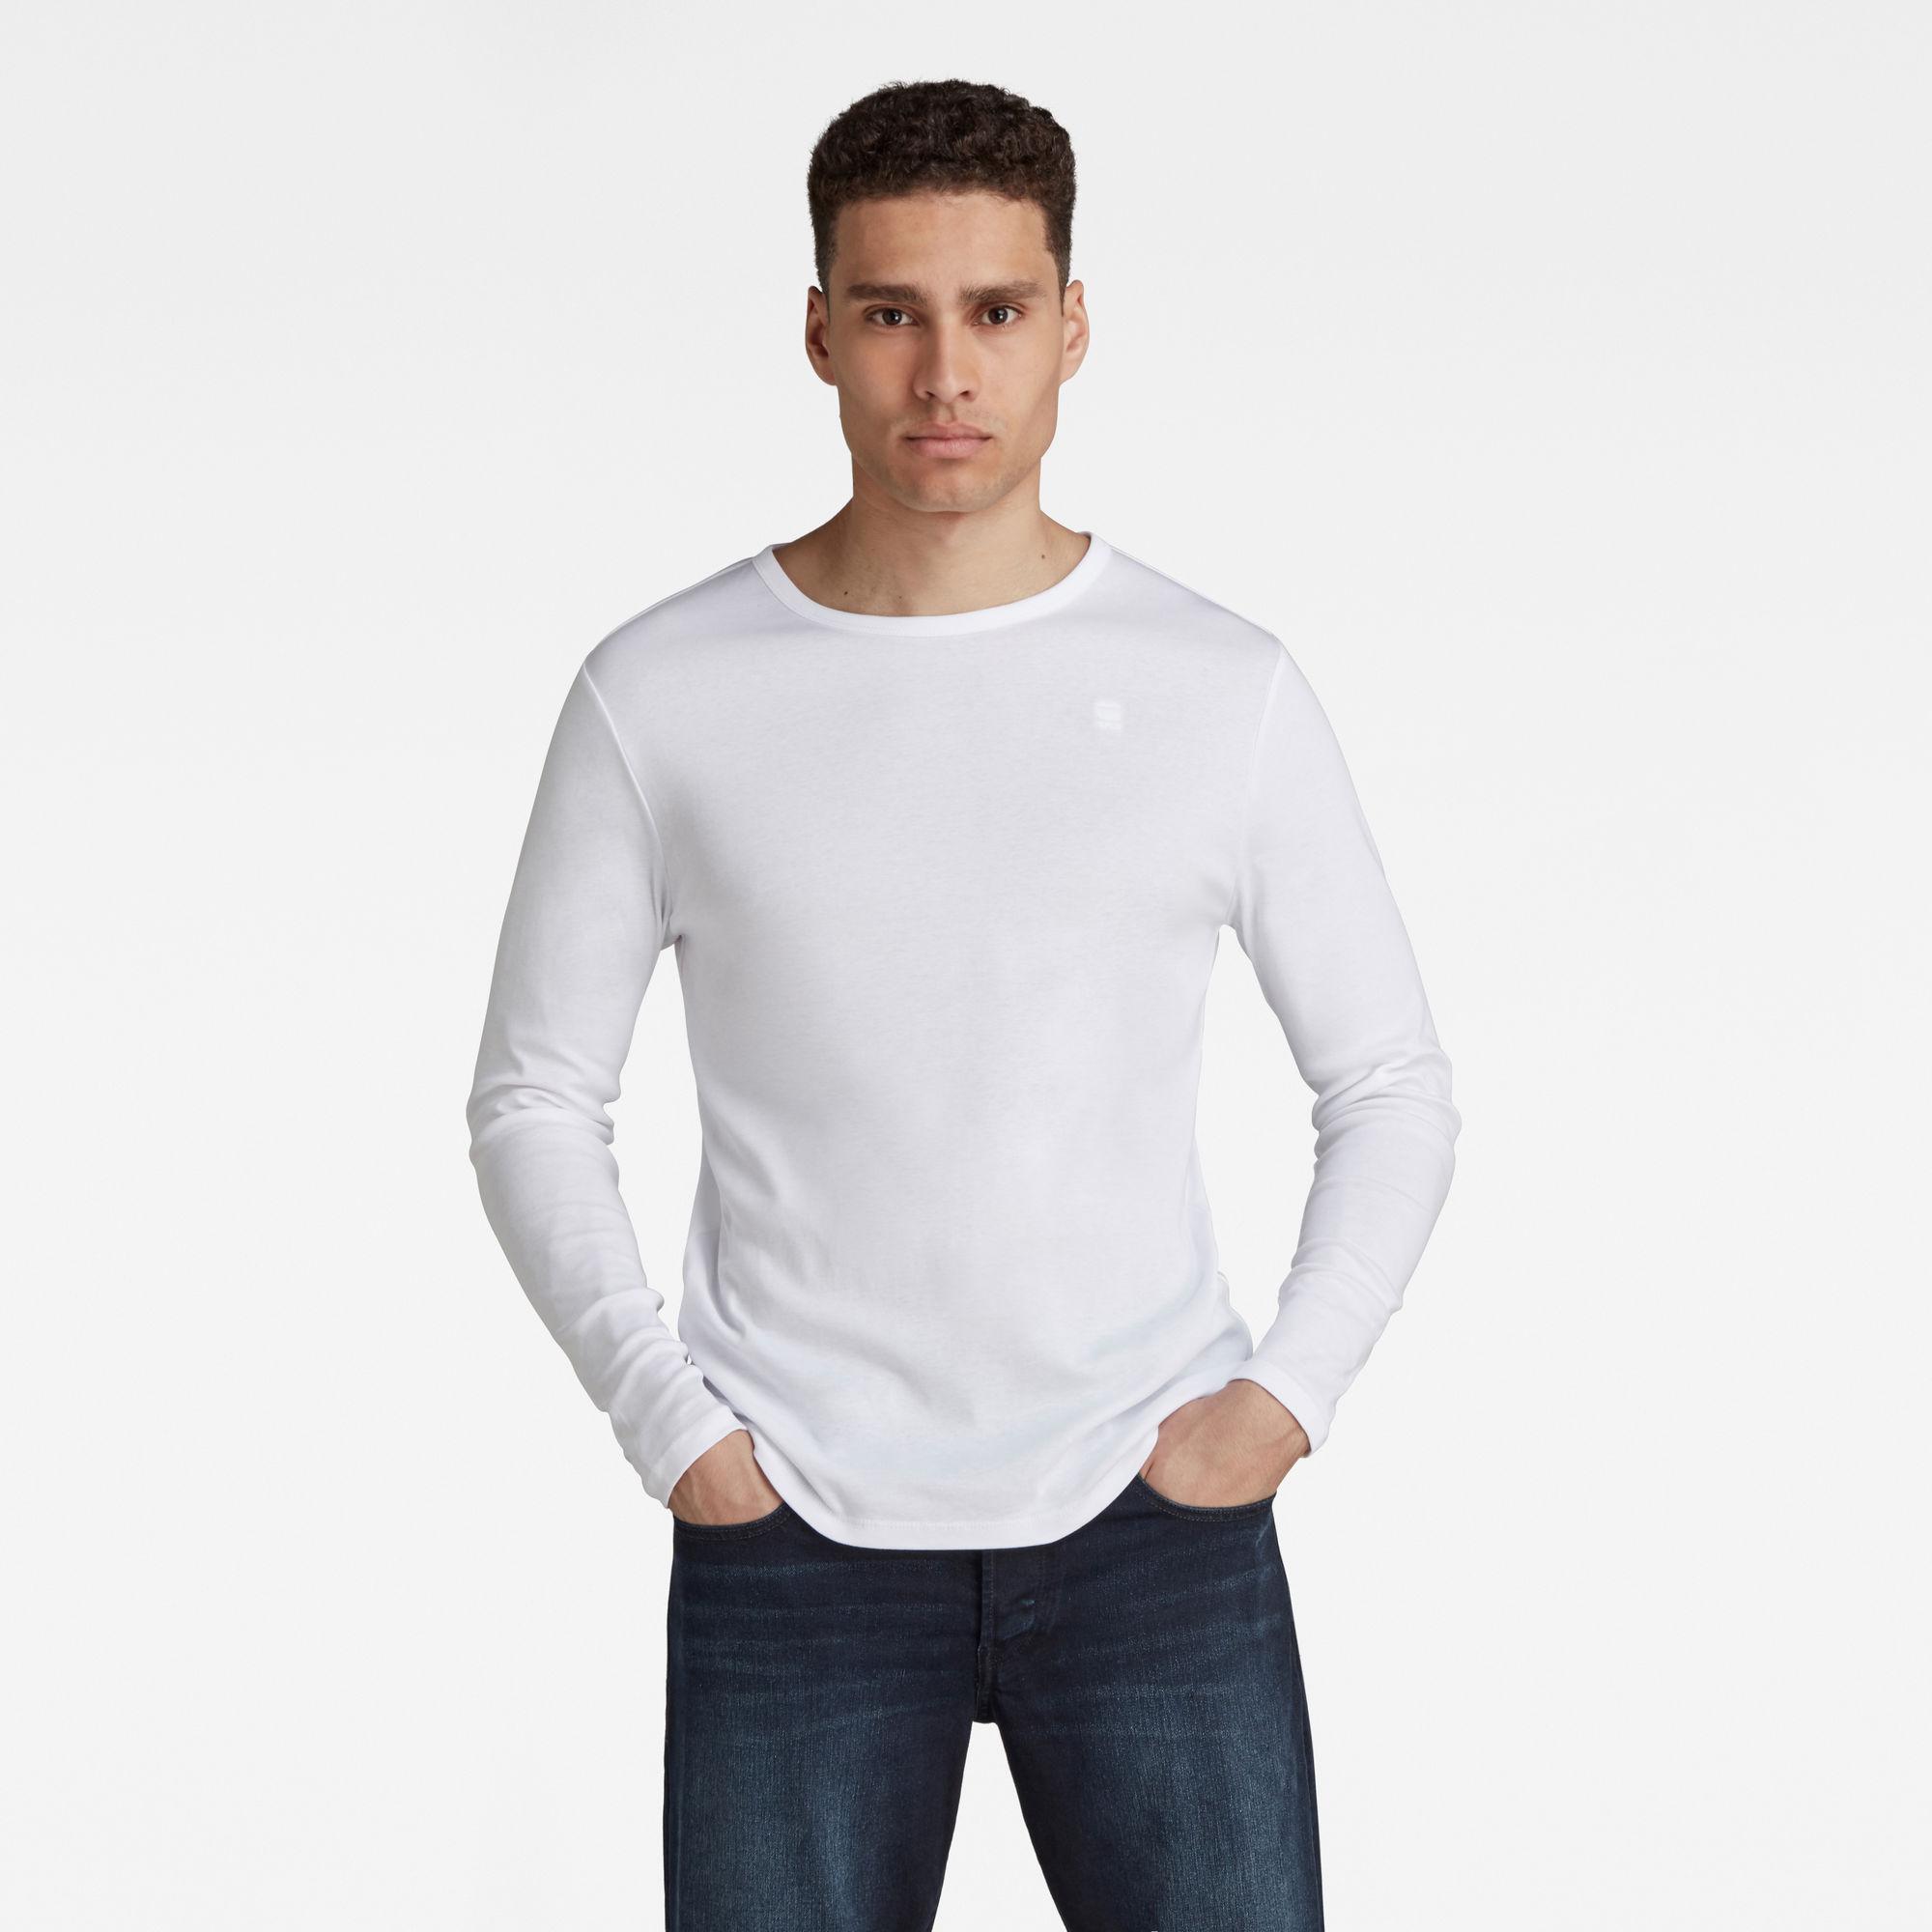 G-Star RAW Heren Basic Round Neck T-Shirt Wit